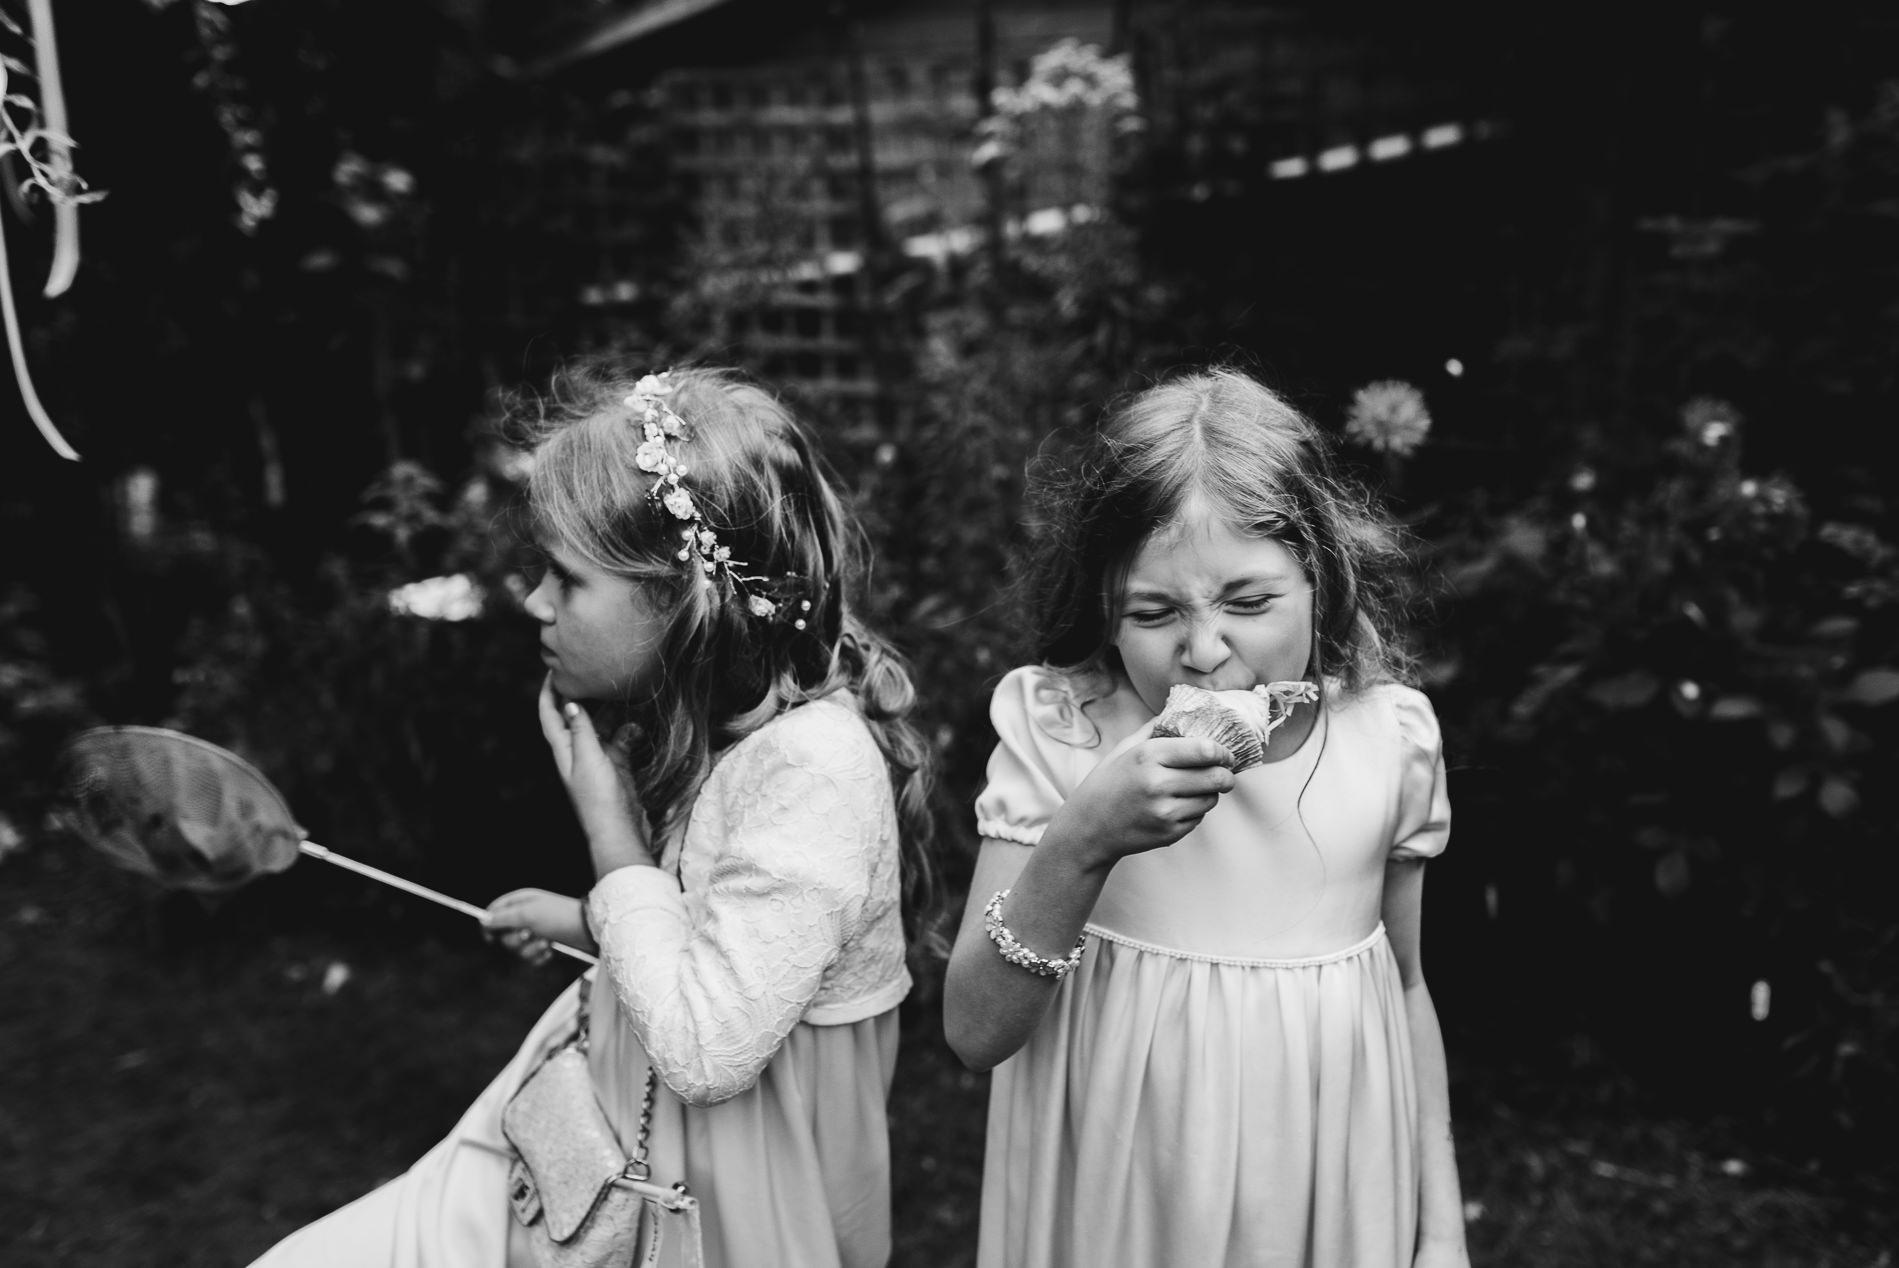 bohemian_wedding_lawshall_church_garden115